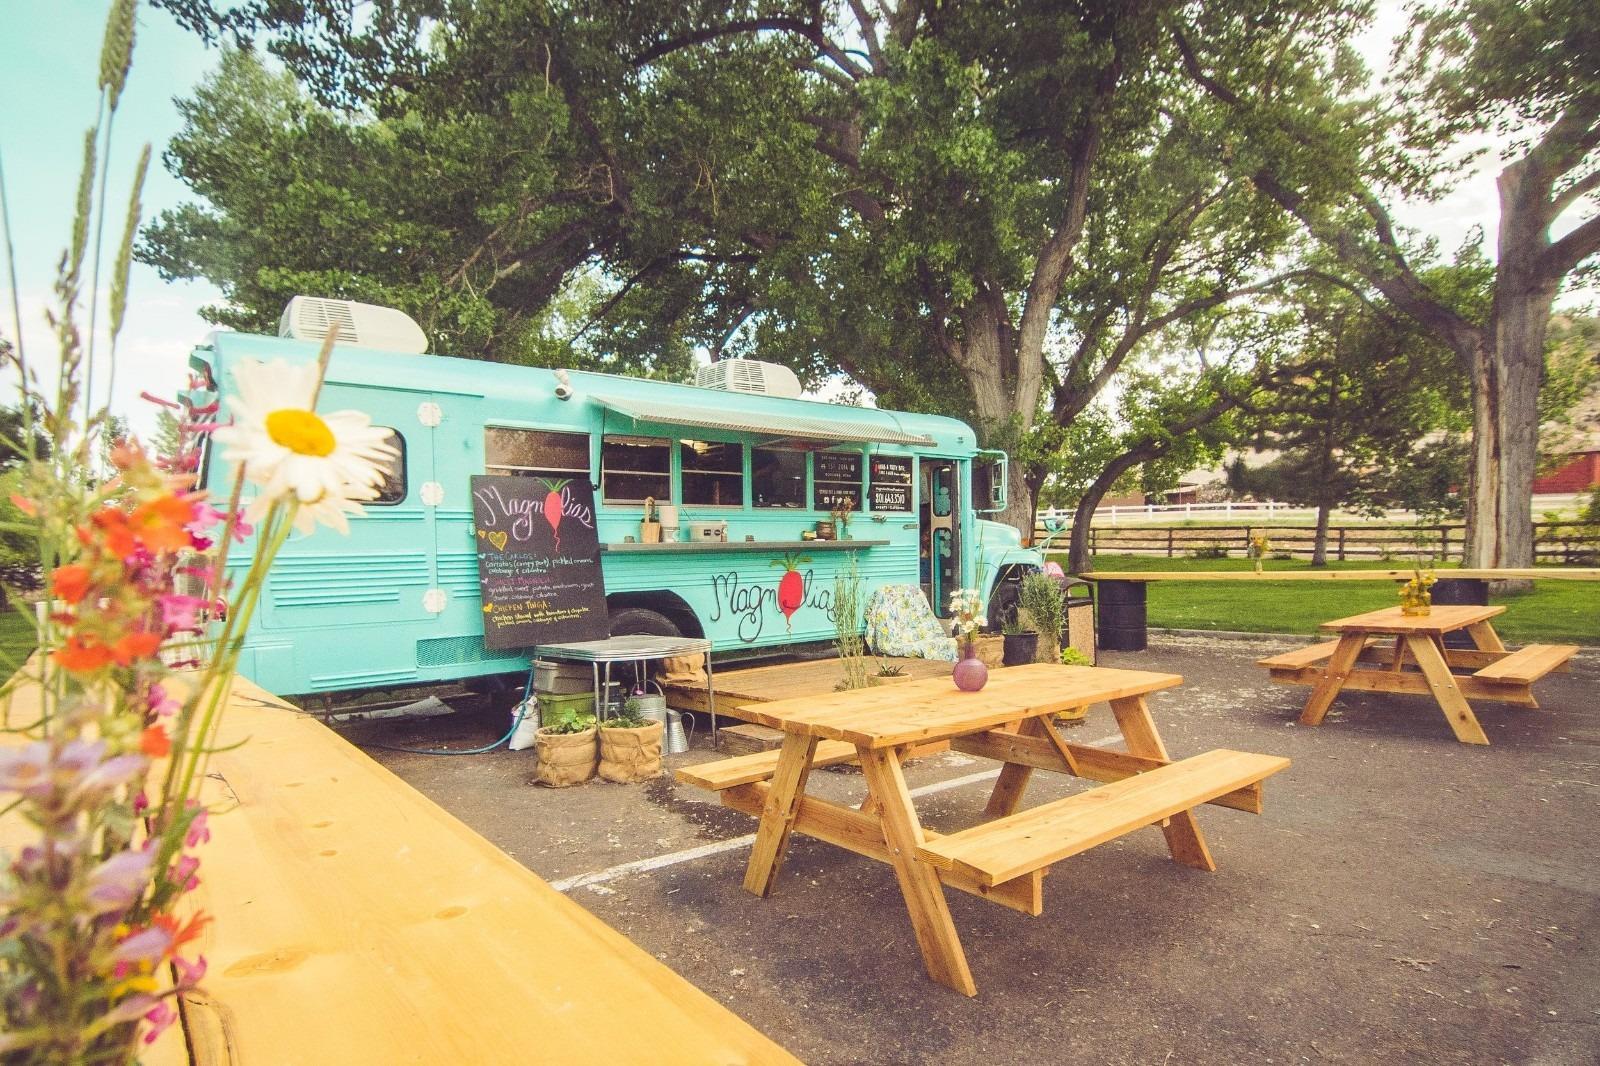 Magnolia Food Truck outside of the Anasazi Museum